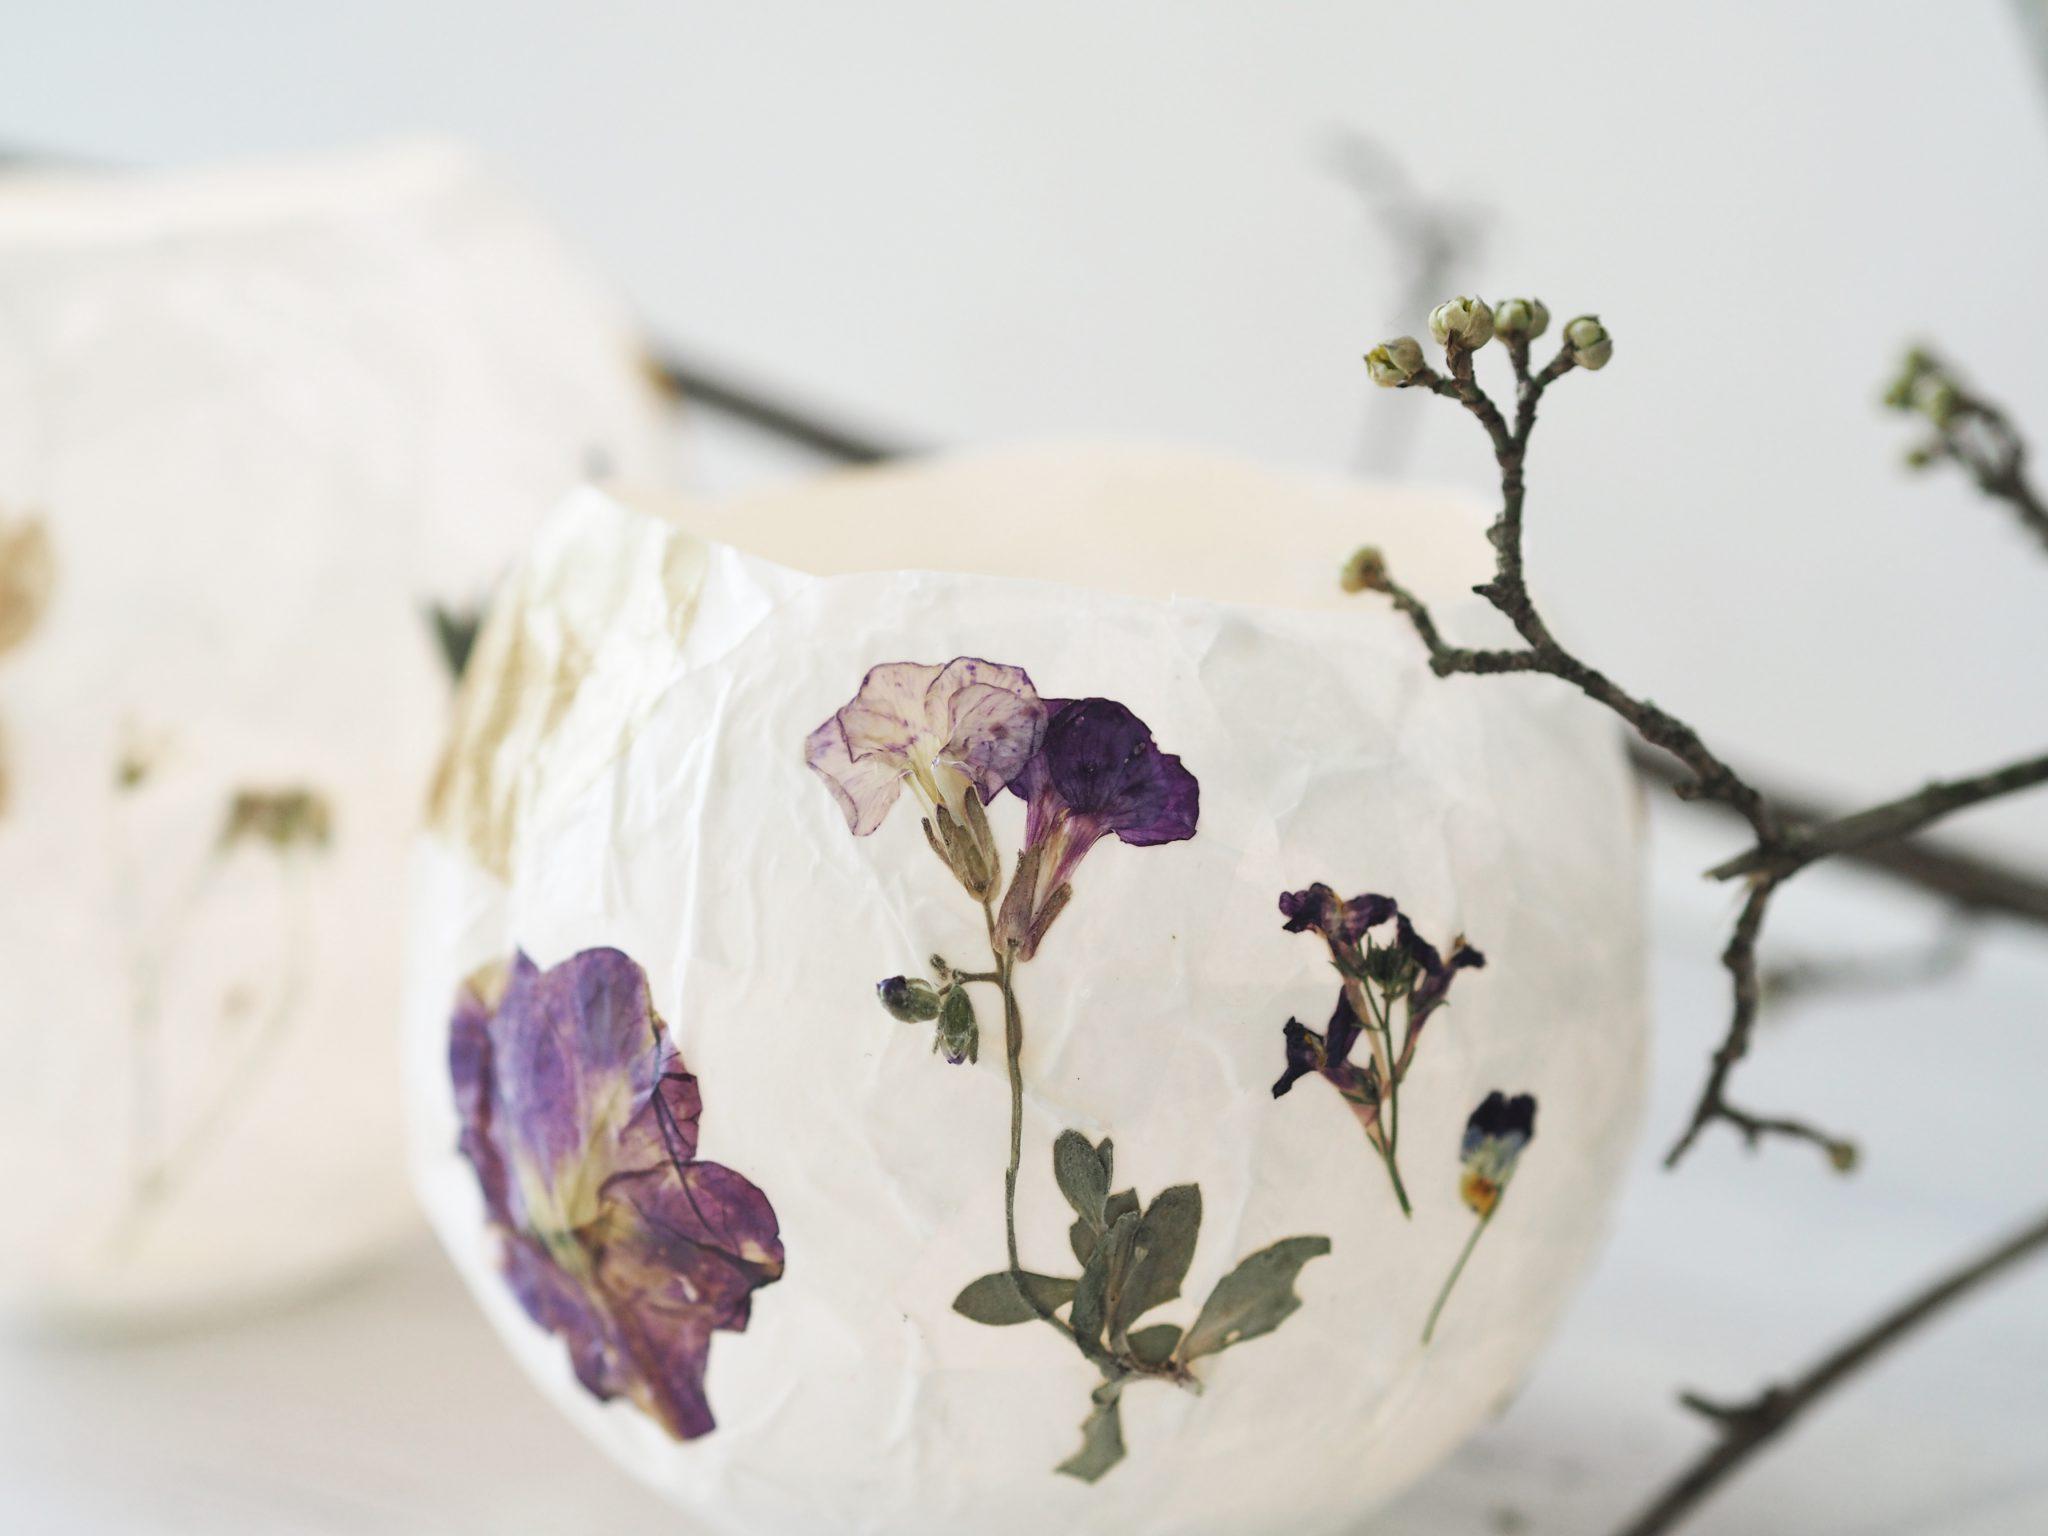 P6250317 - Selbstgemachte Lampions mit getrockneten Blüten